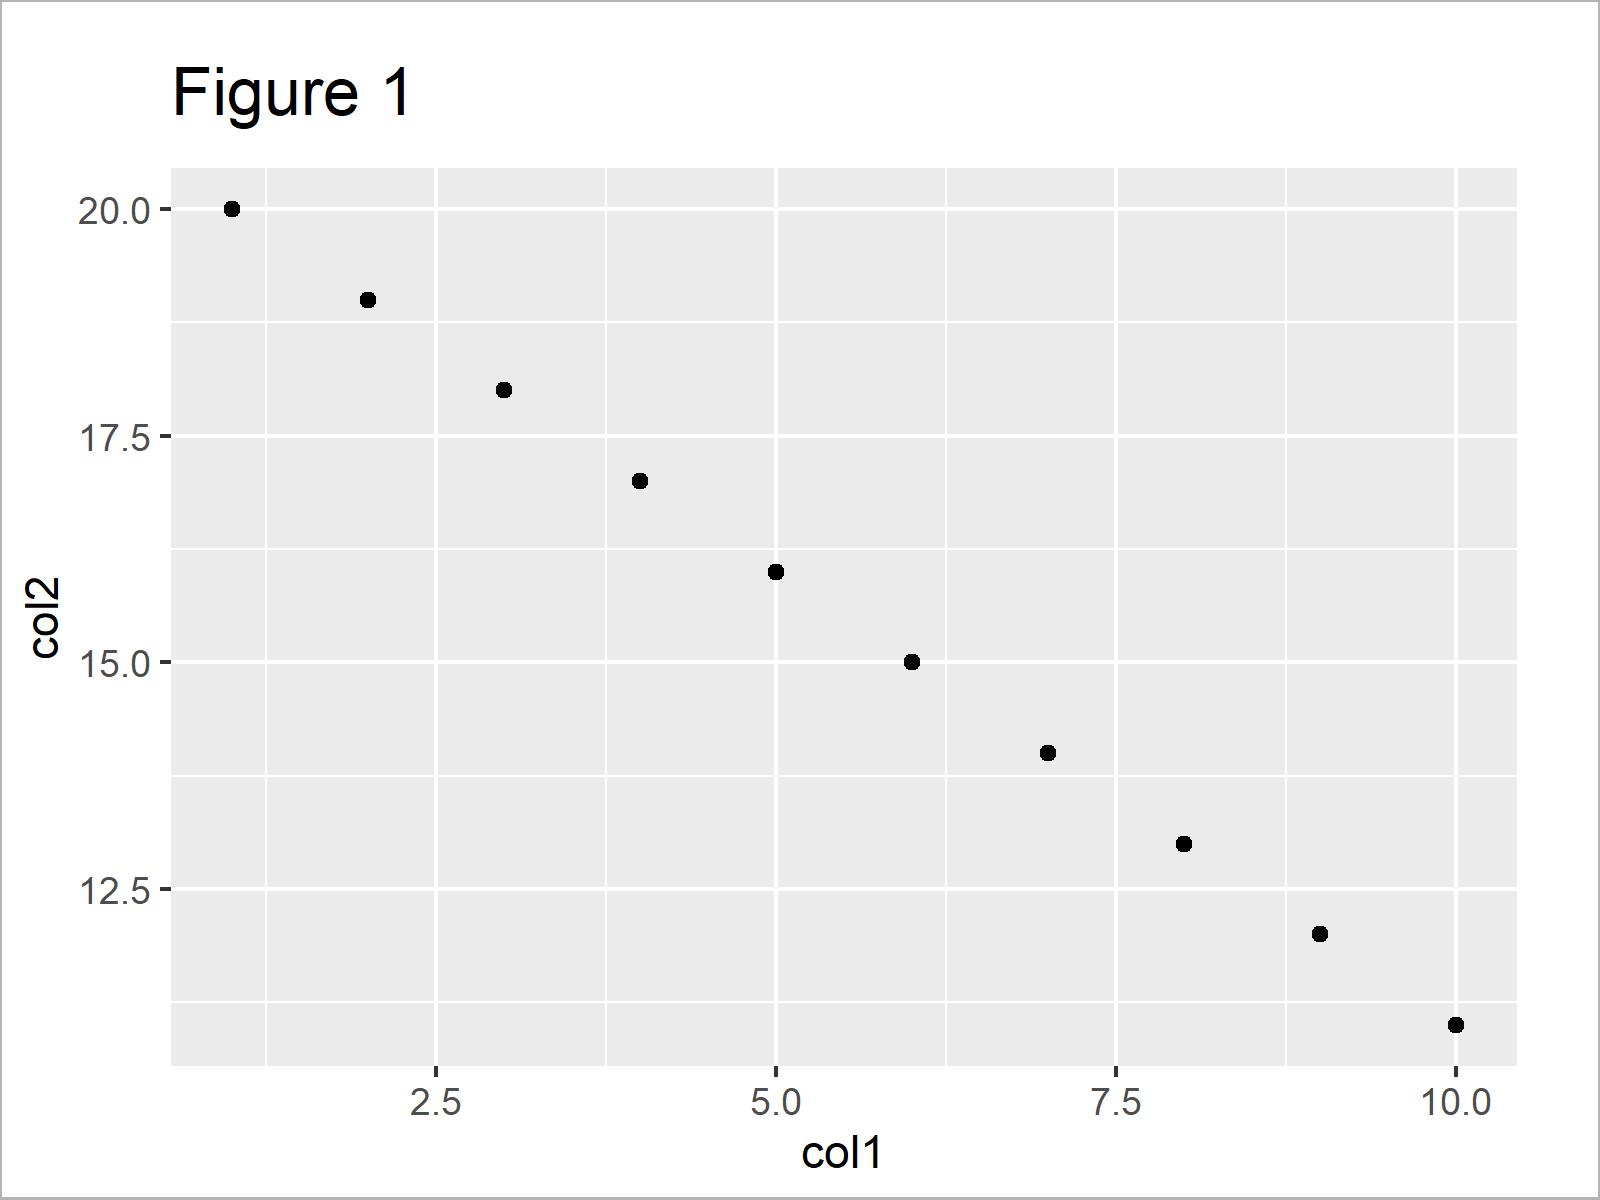 r graph figure 1 r ggplot2 error geom_point requires missing aesthetics